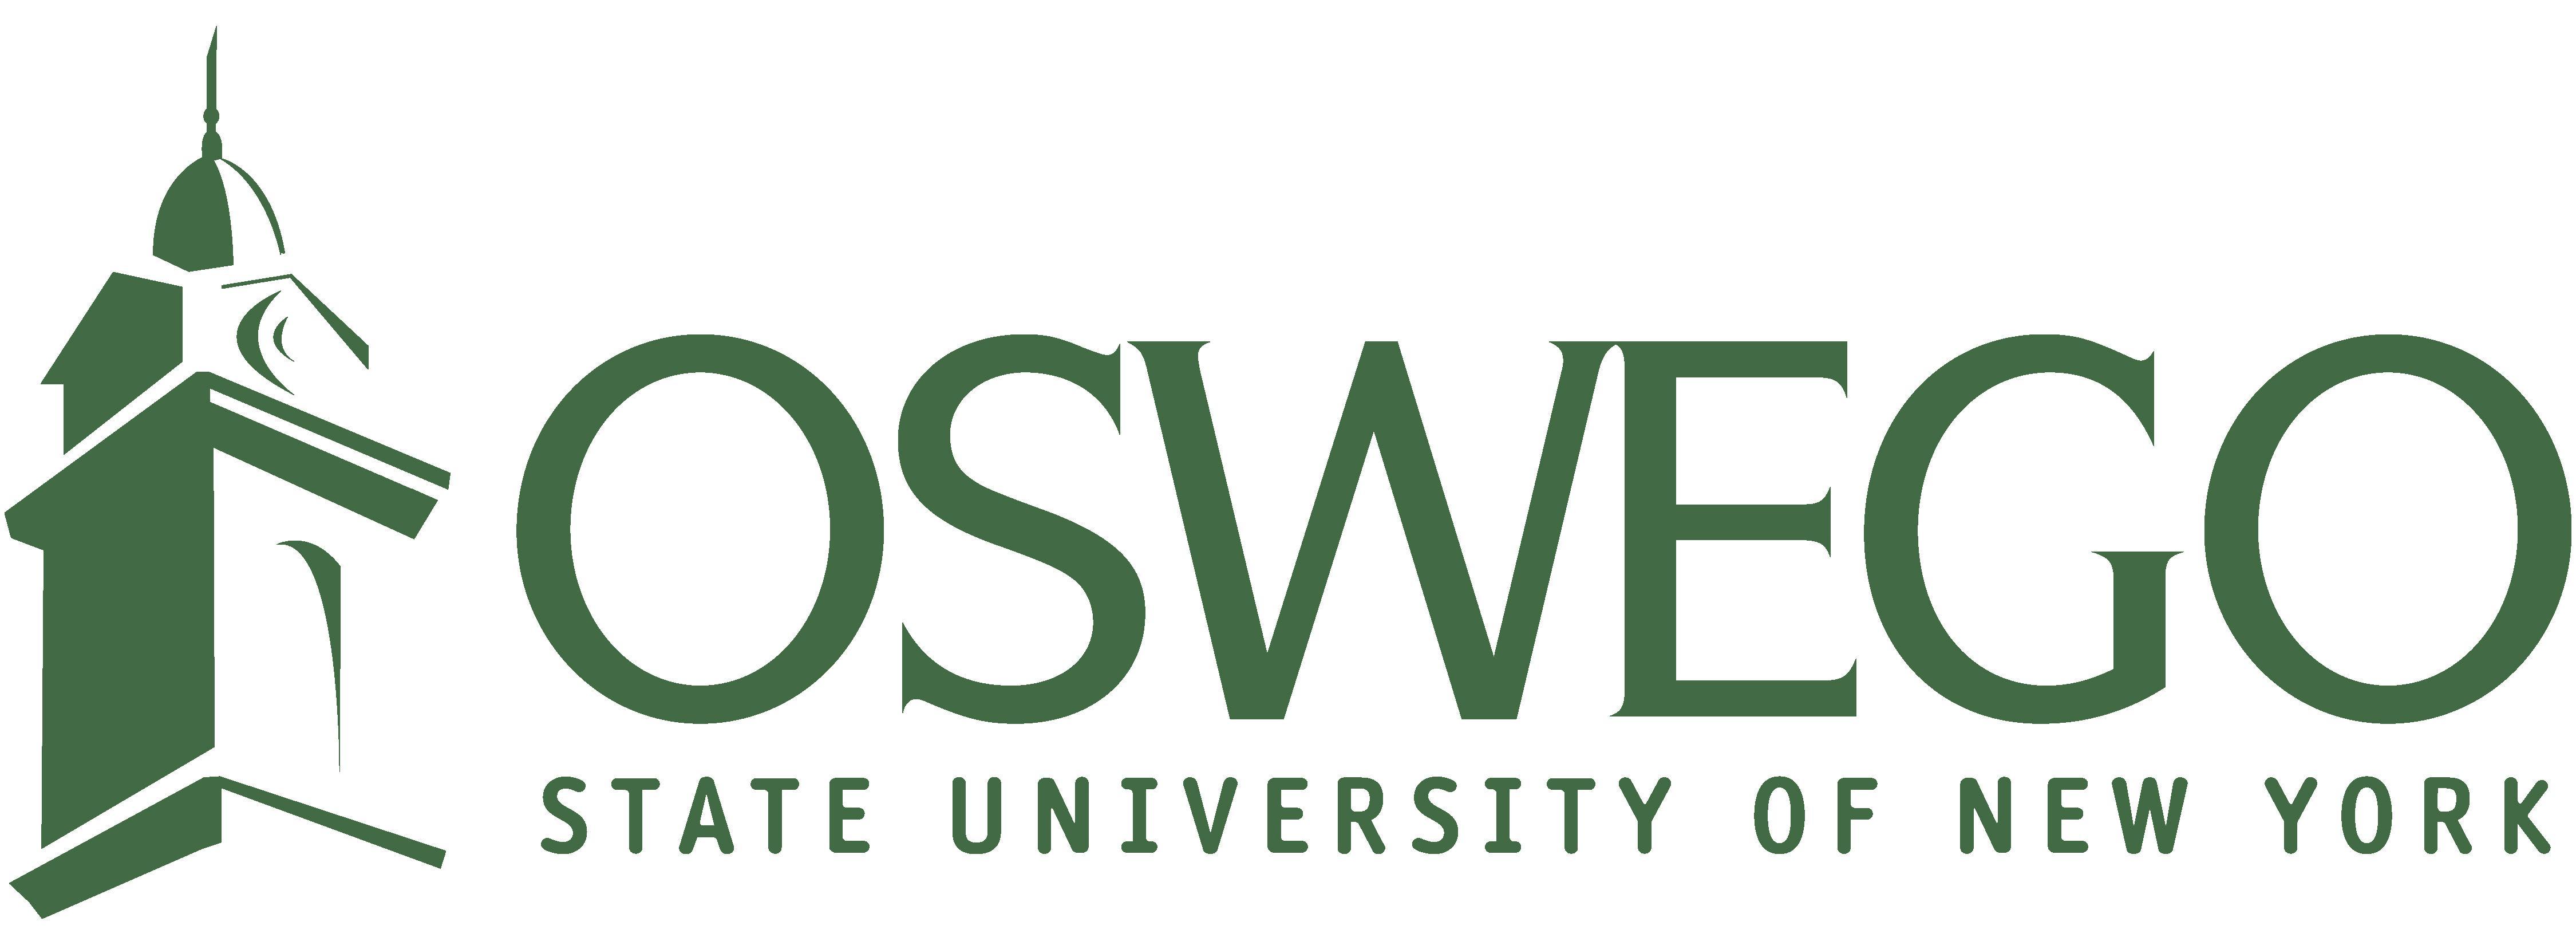 https://acquia-prod.oswego.edu/publications/sites/acquia-prod.oswego.edu.publications/files/styles/panopoly_image_original/public/oswego_logo_horiz_grn_0.jpg